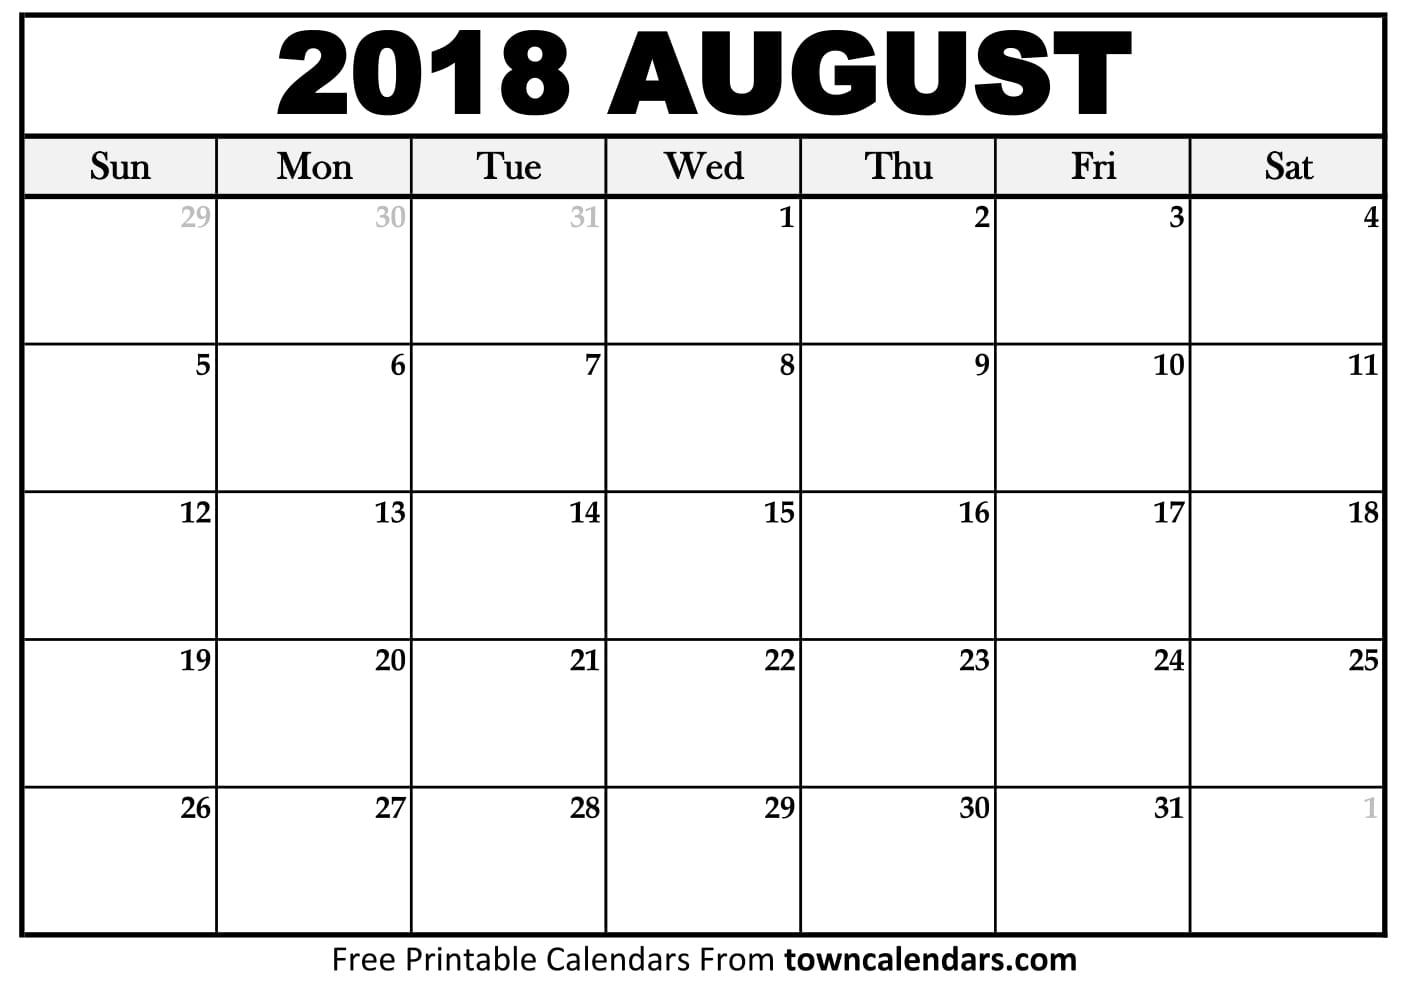 Free 5 August 2018 Calendar Printable Template Source